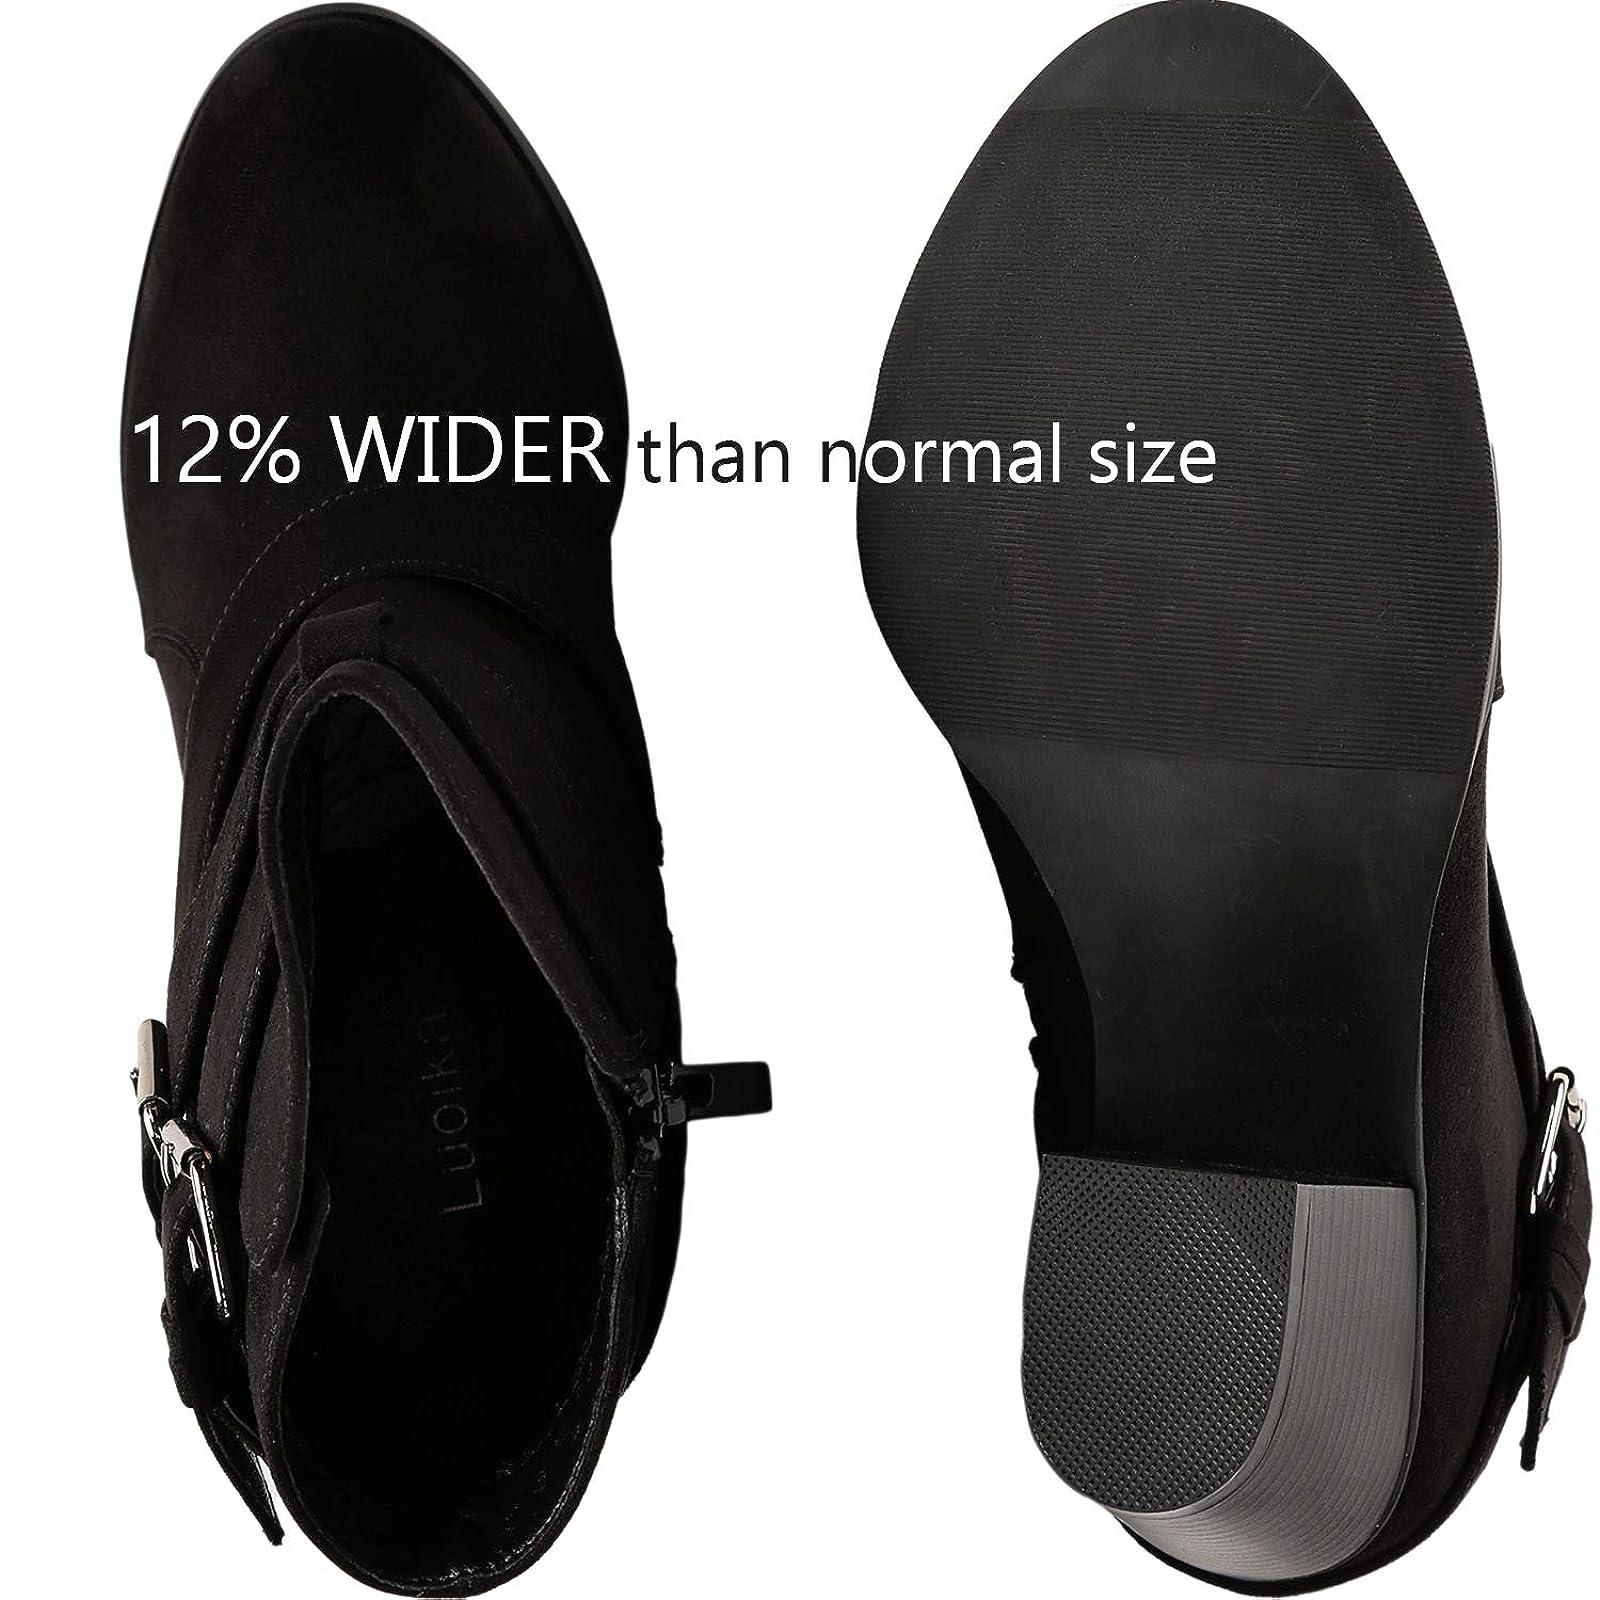 Luoika Women's Wide Width Ankle Boots - Black 10 XW US - 3